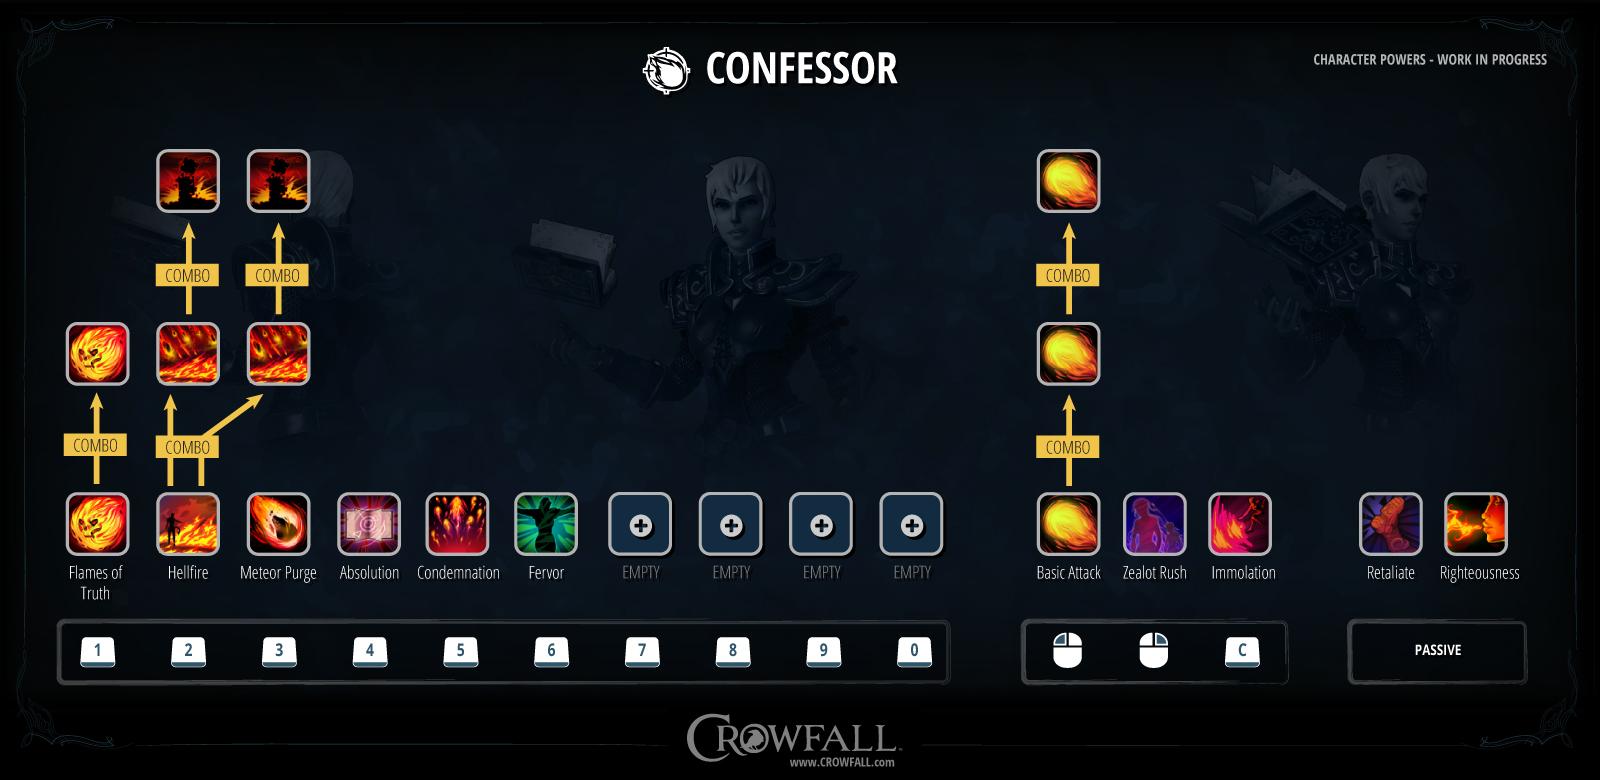 ConfessorAbilityTree_Final.jpg